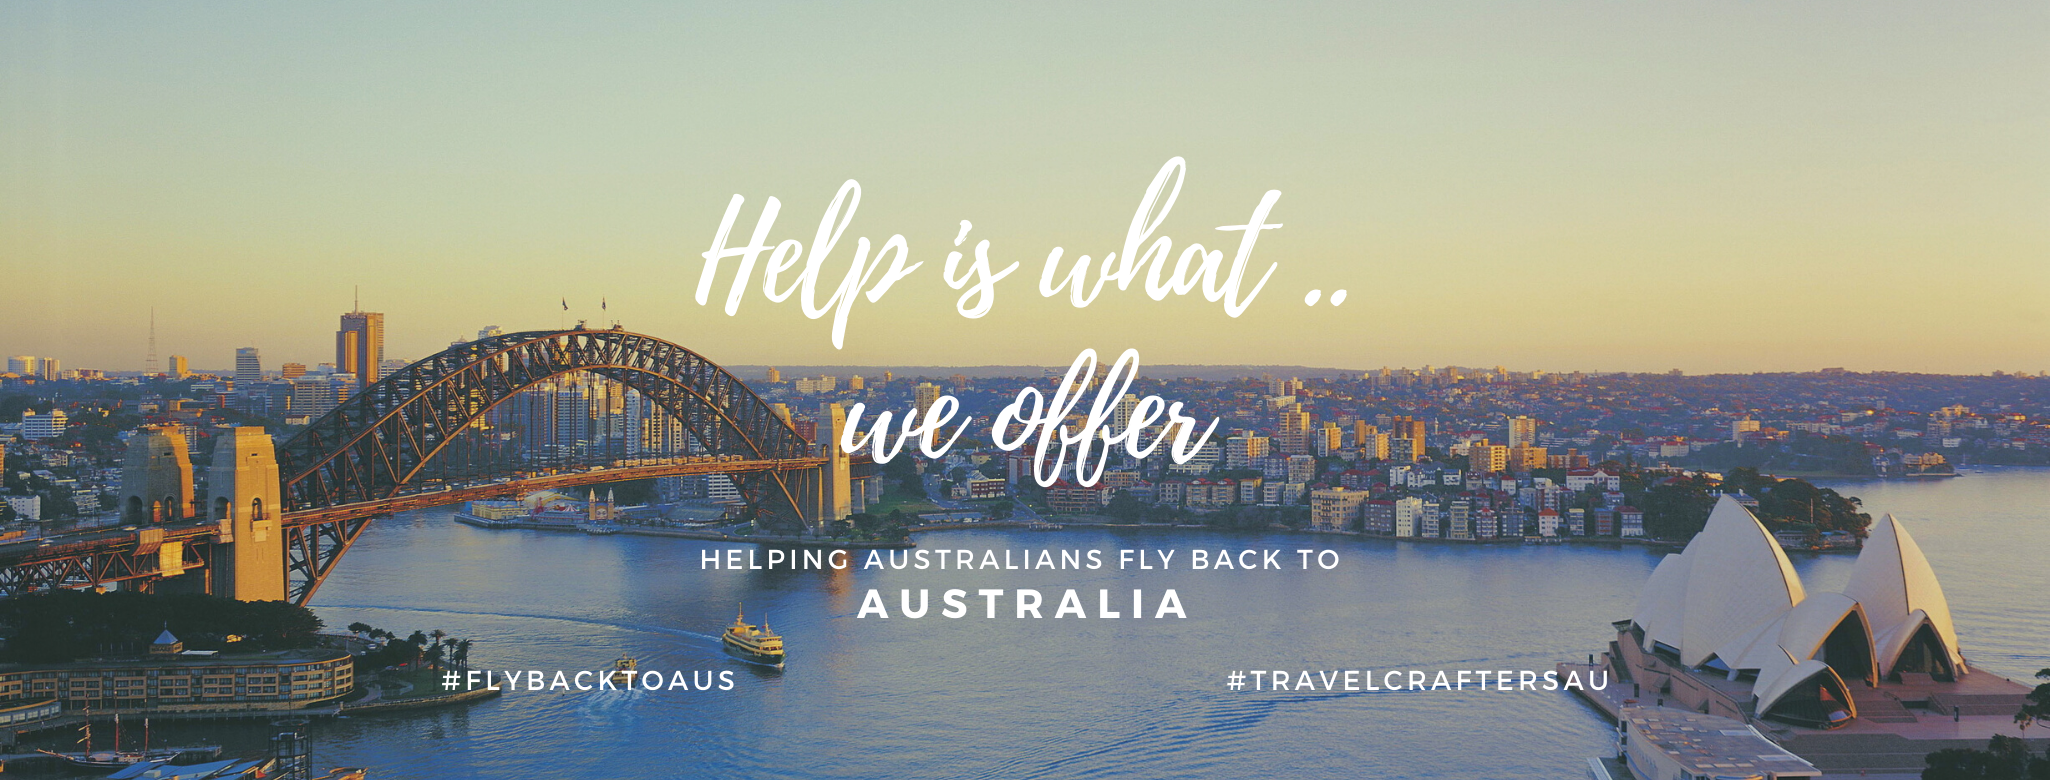 Australian stranded overseas